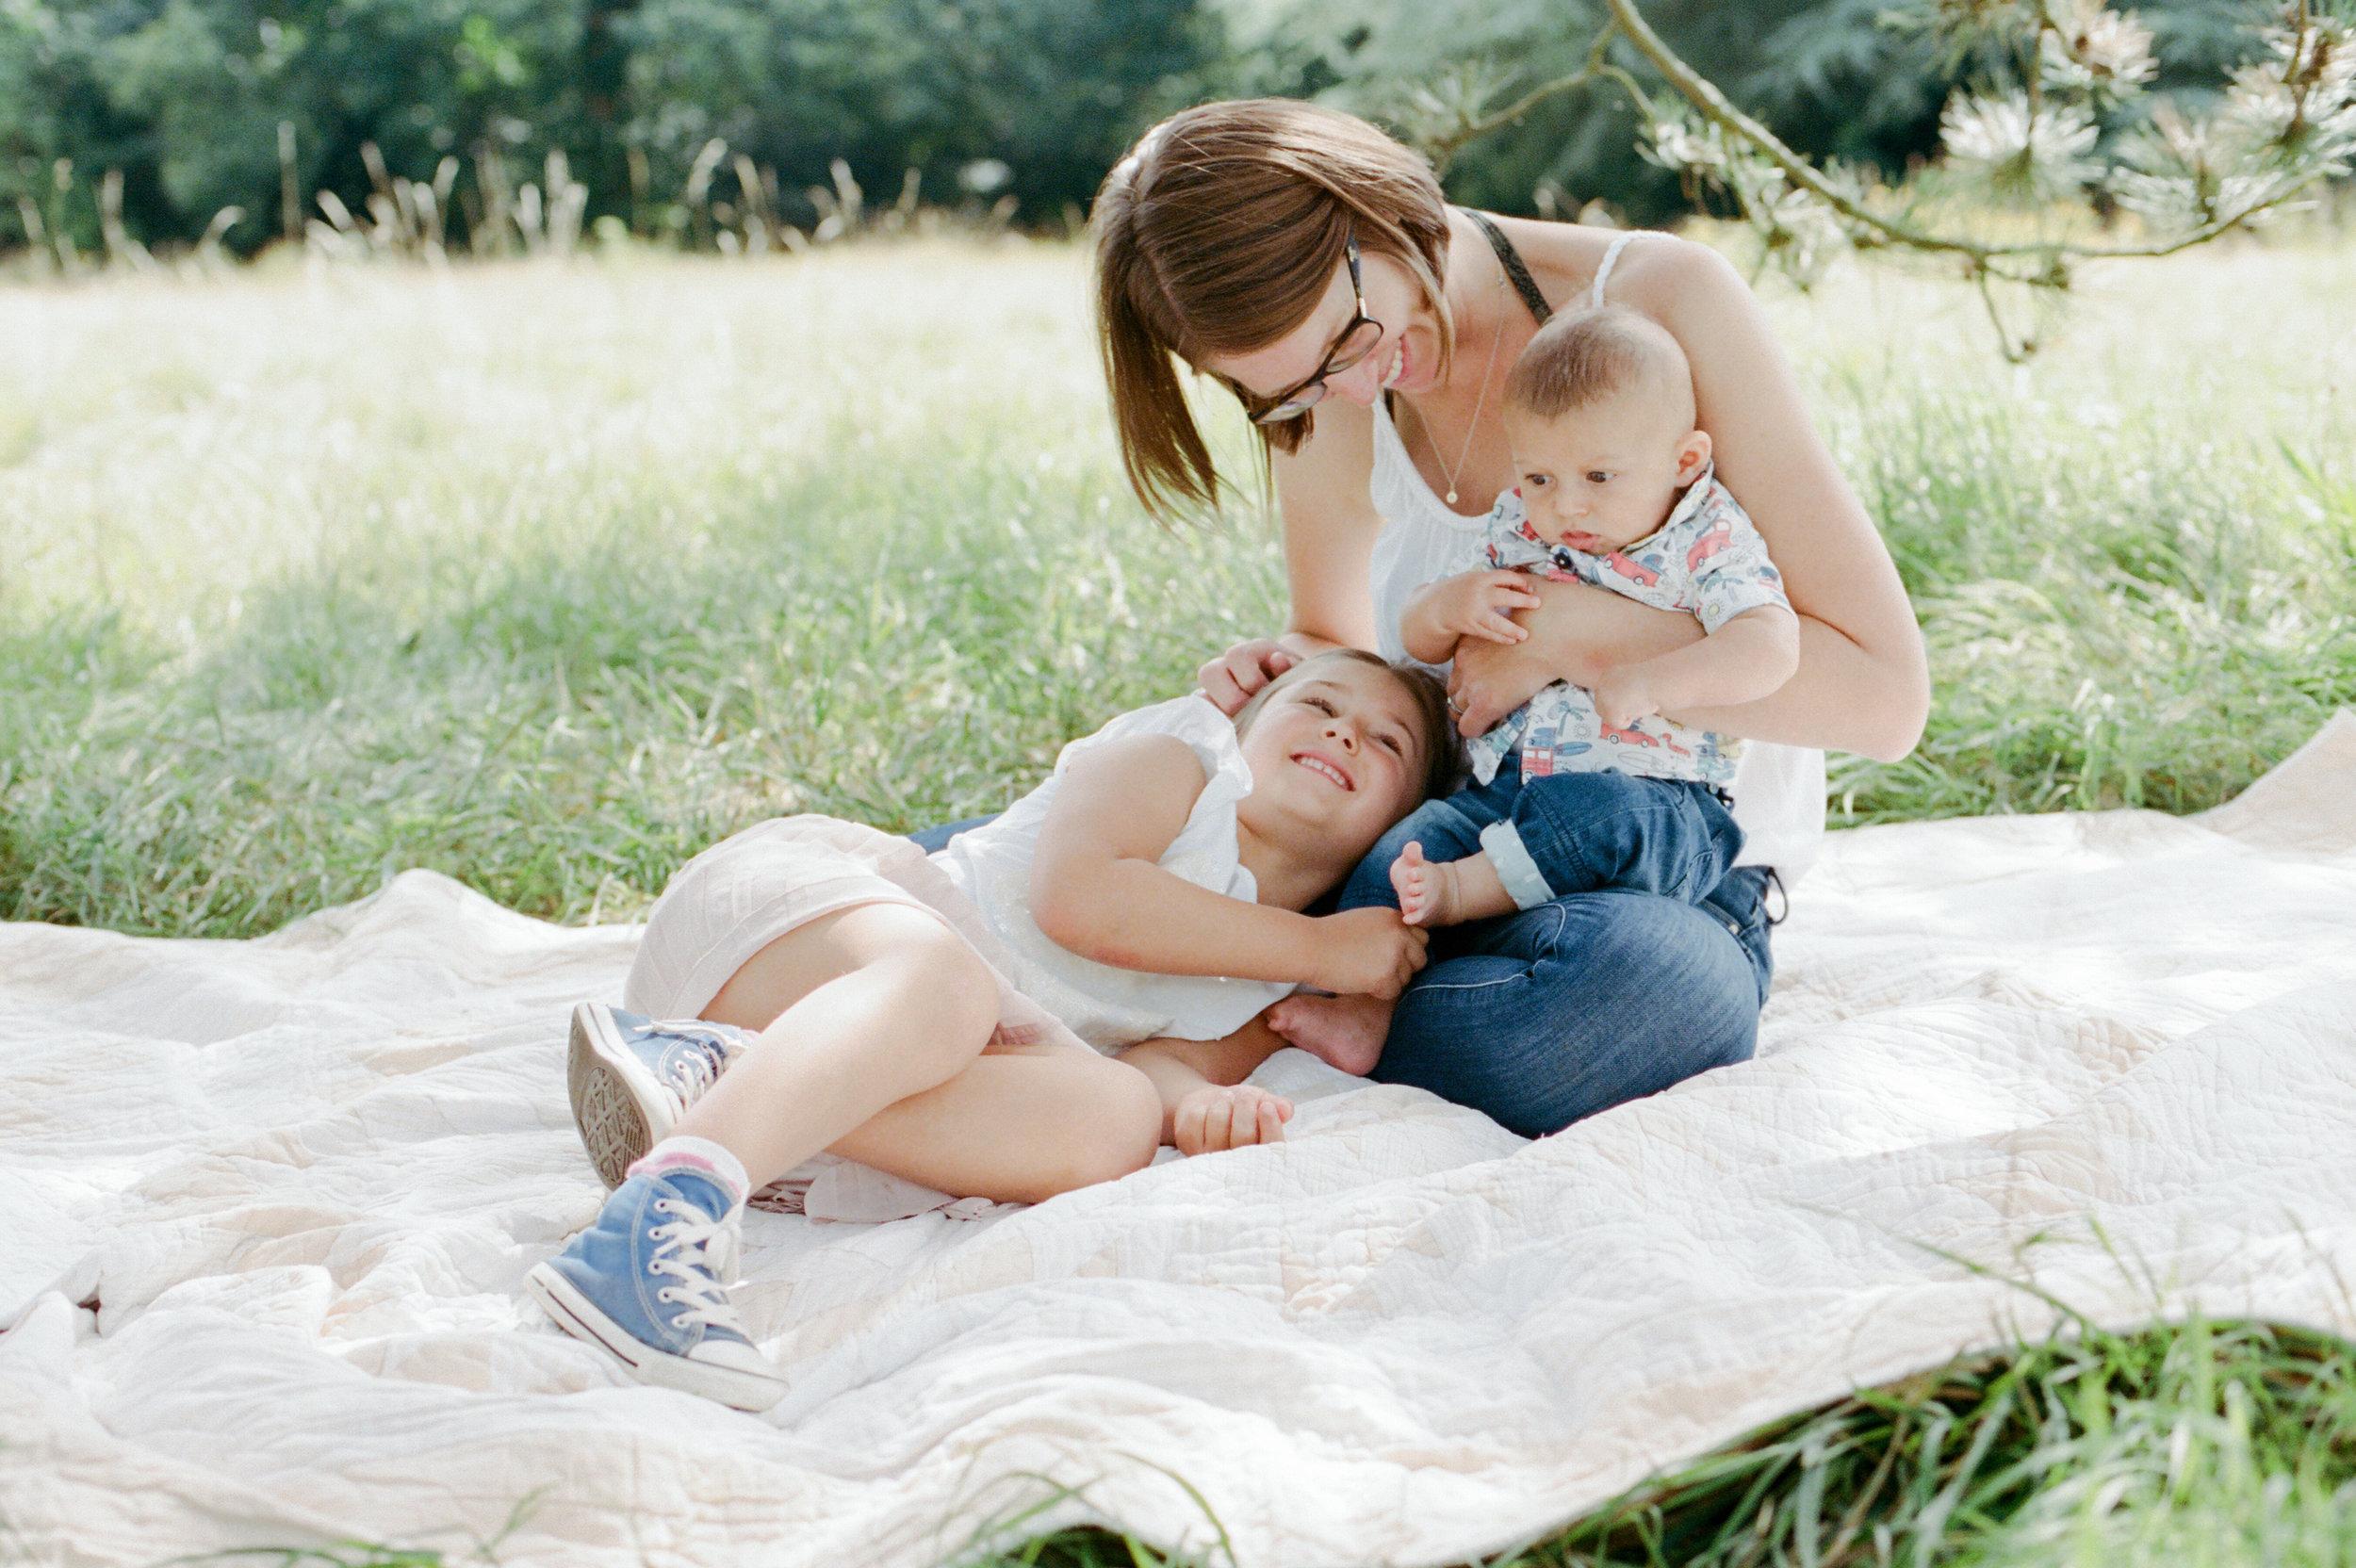 Nicola_London_Family_Photographer-56 copy.jpg